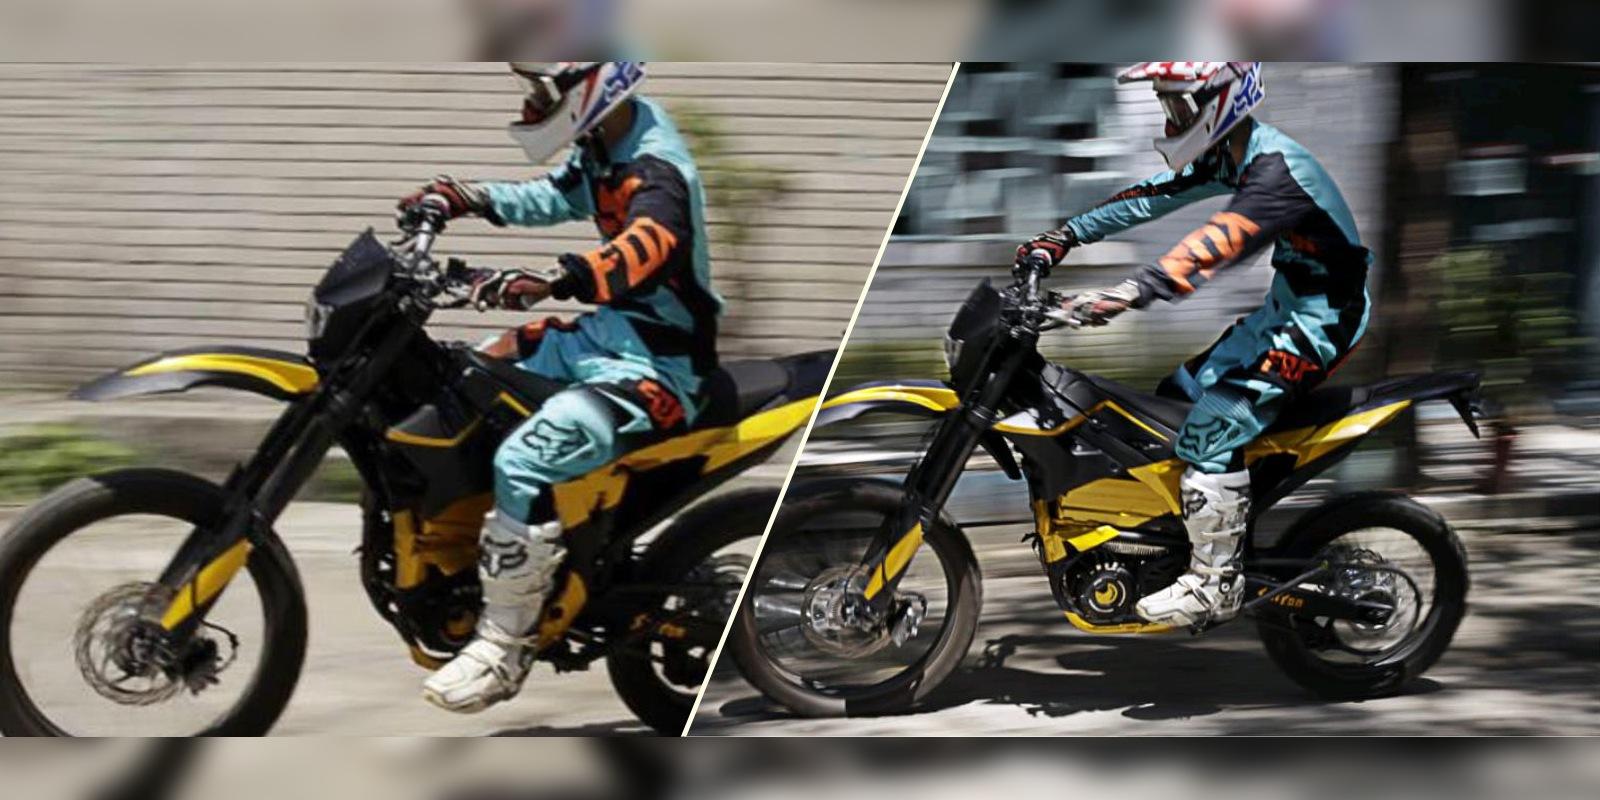 electric motorcycle - Electrek